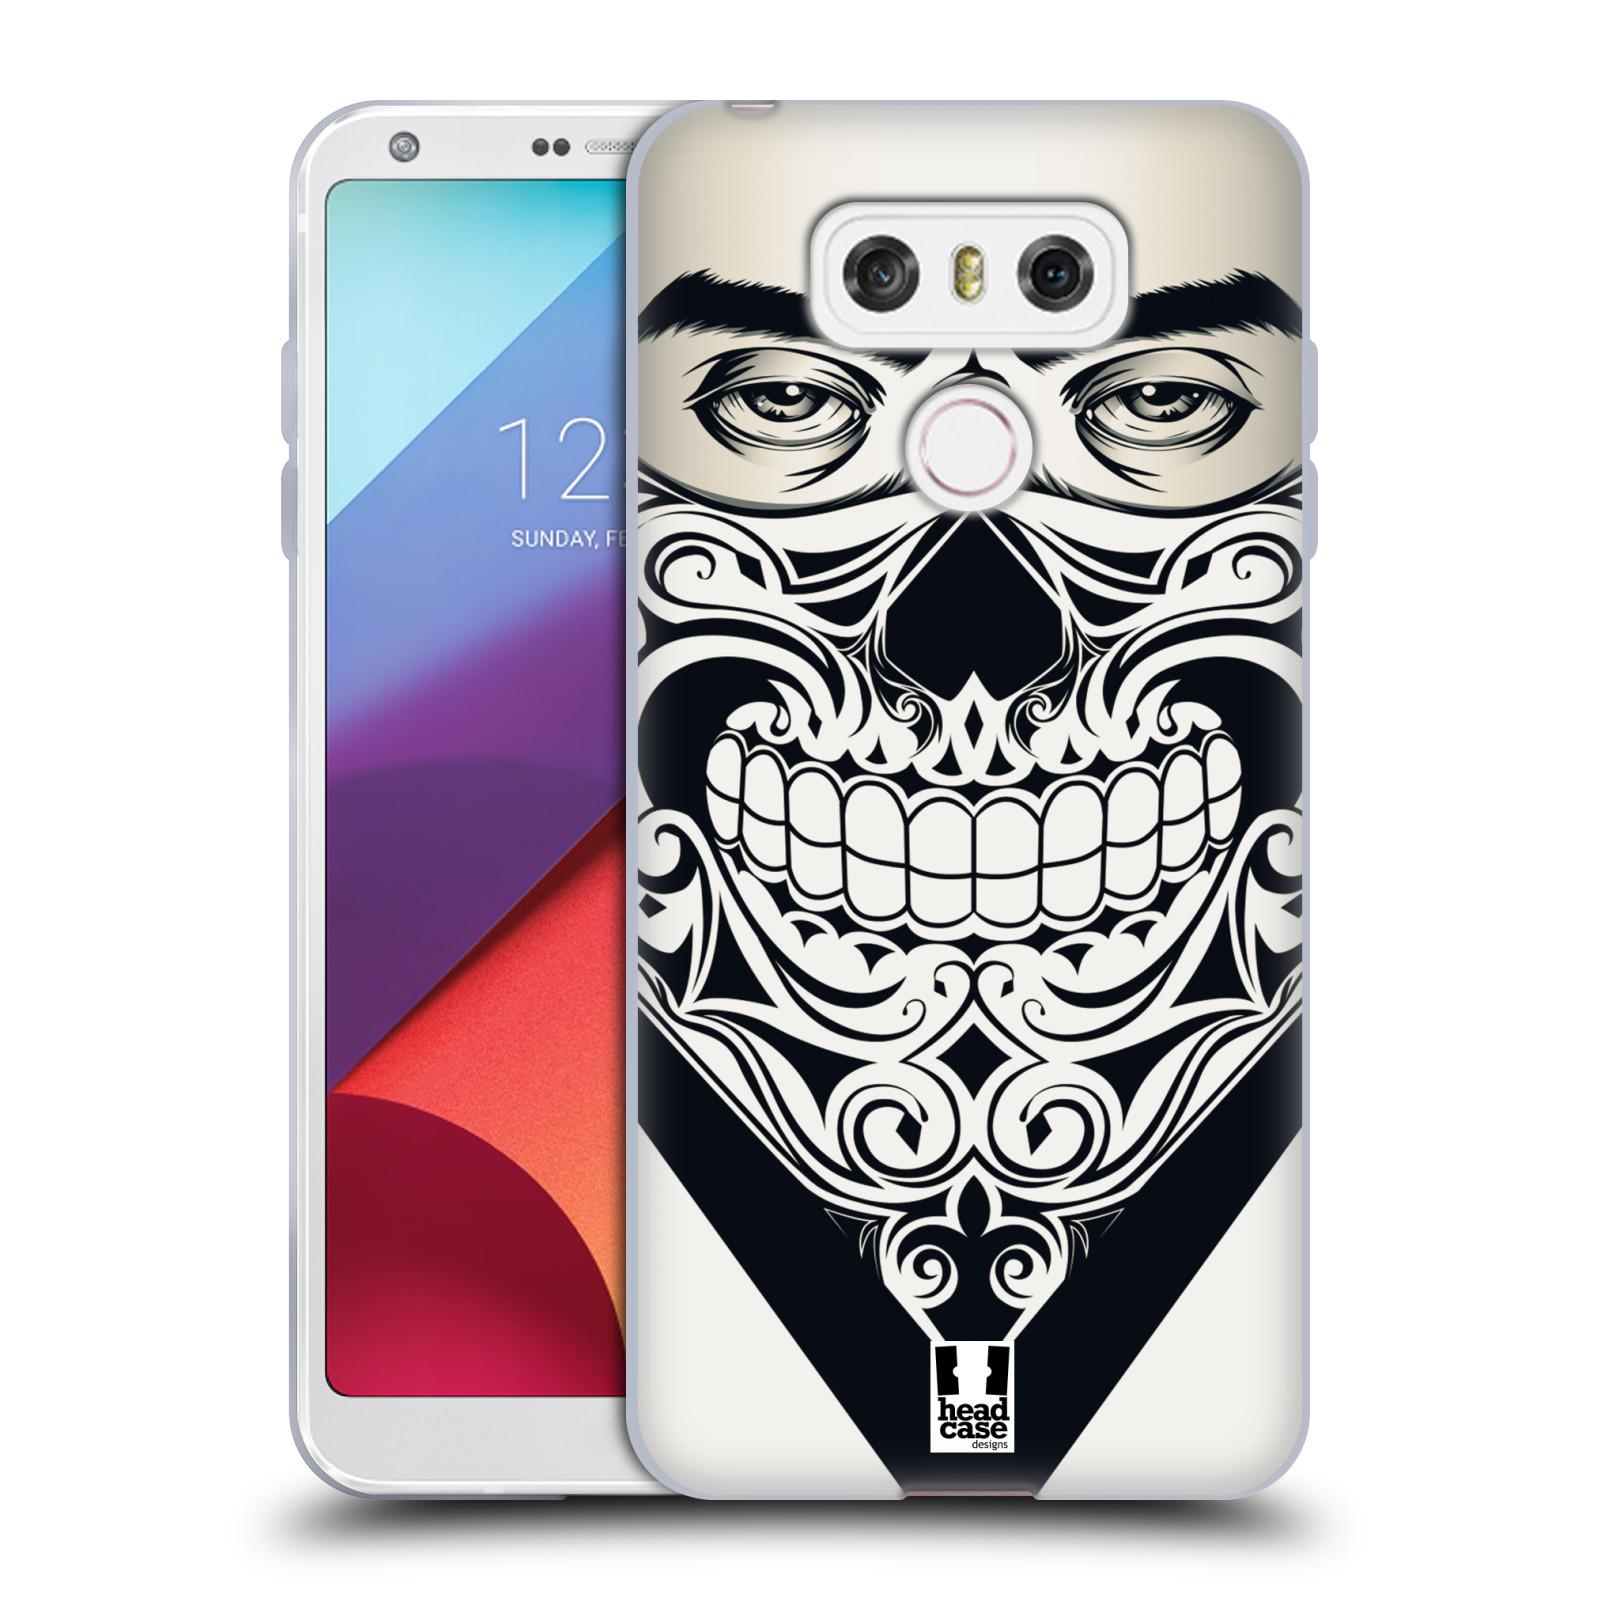 Silikonové pouzdro na mobil LG G6 - Head Case LEBKA BANDANA